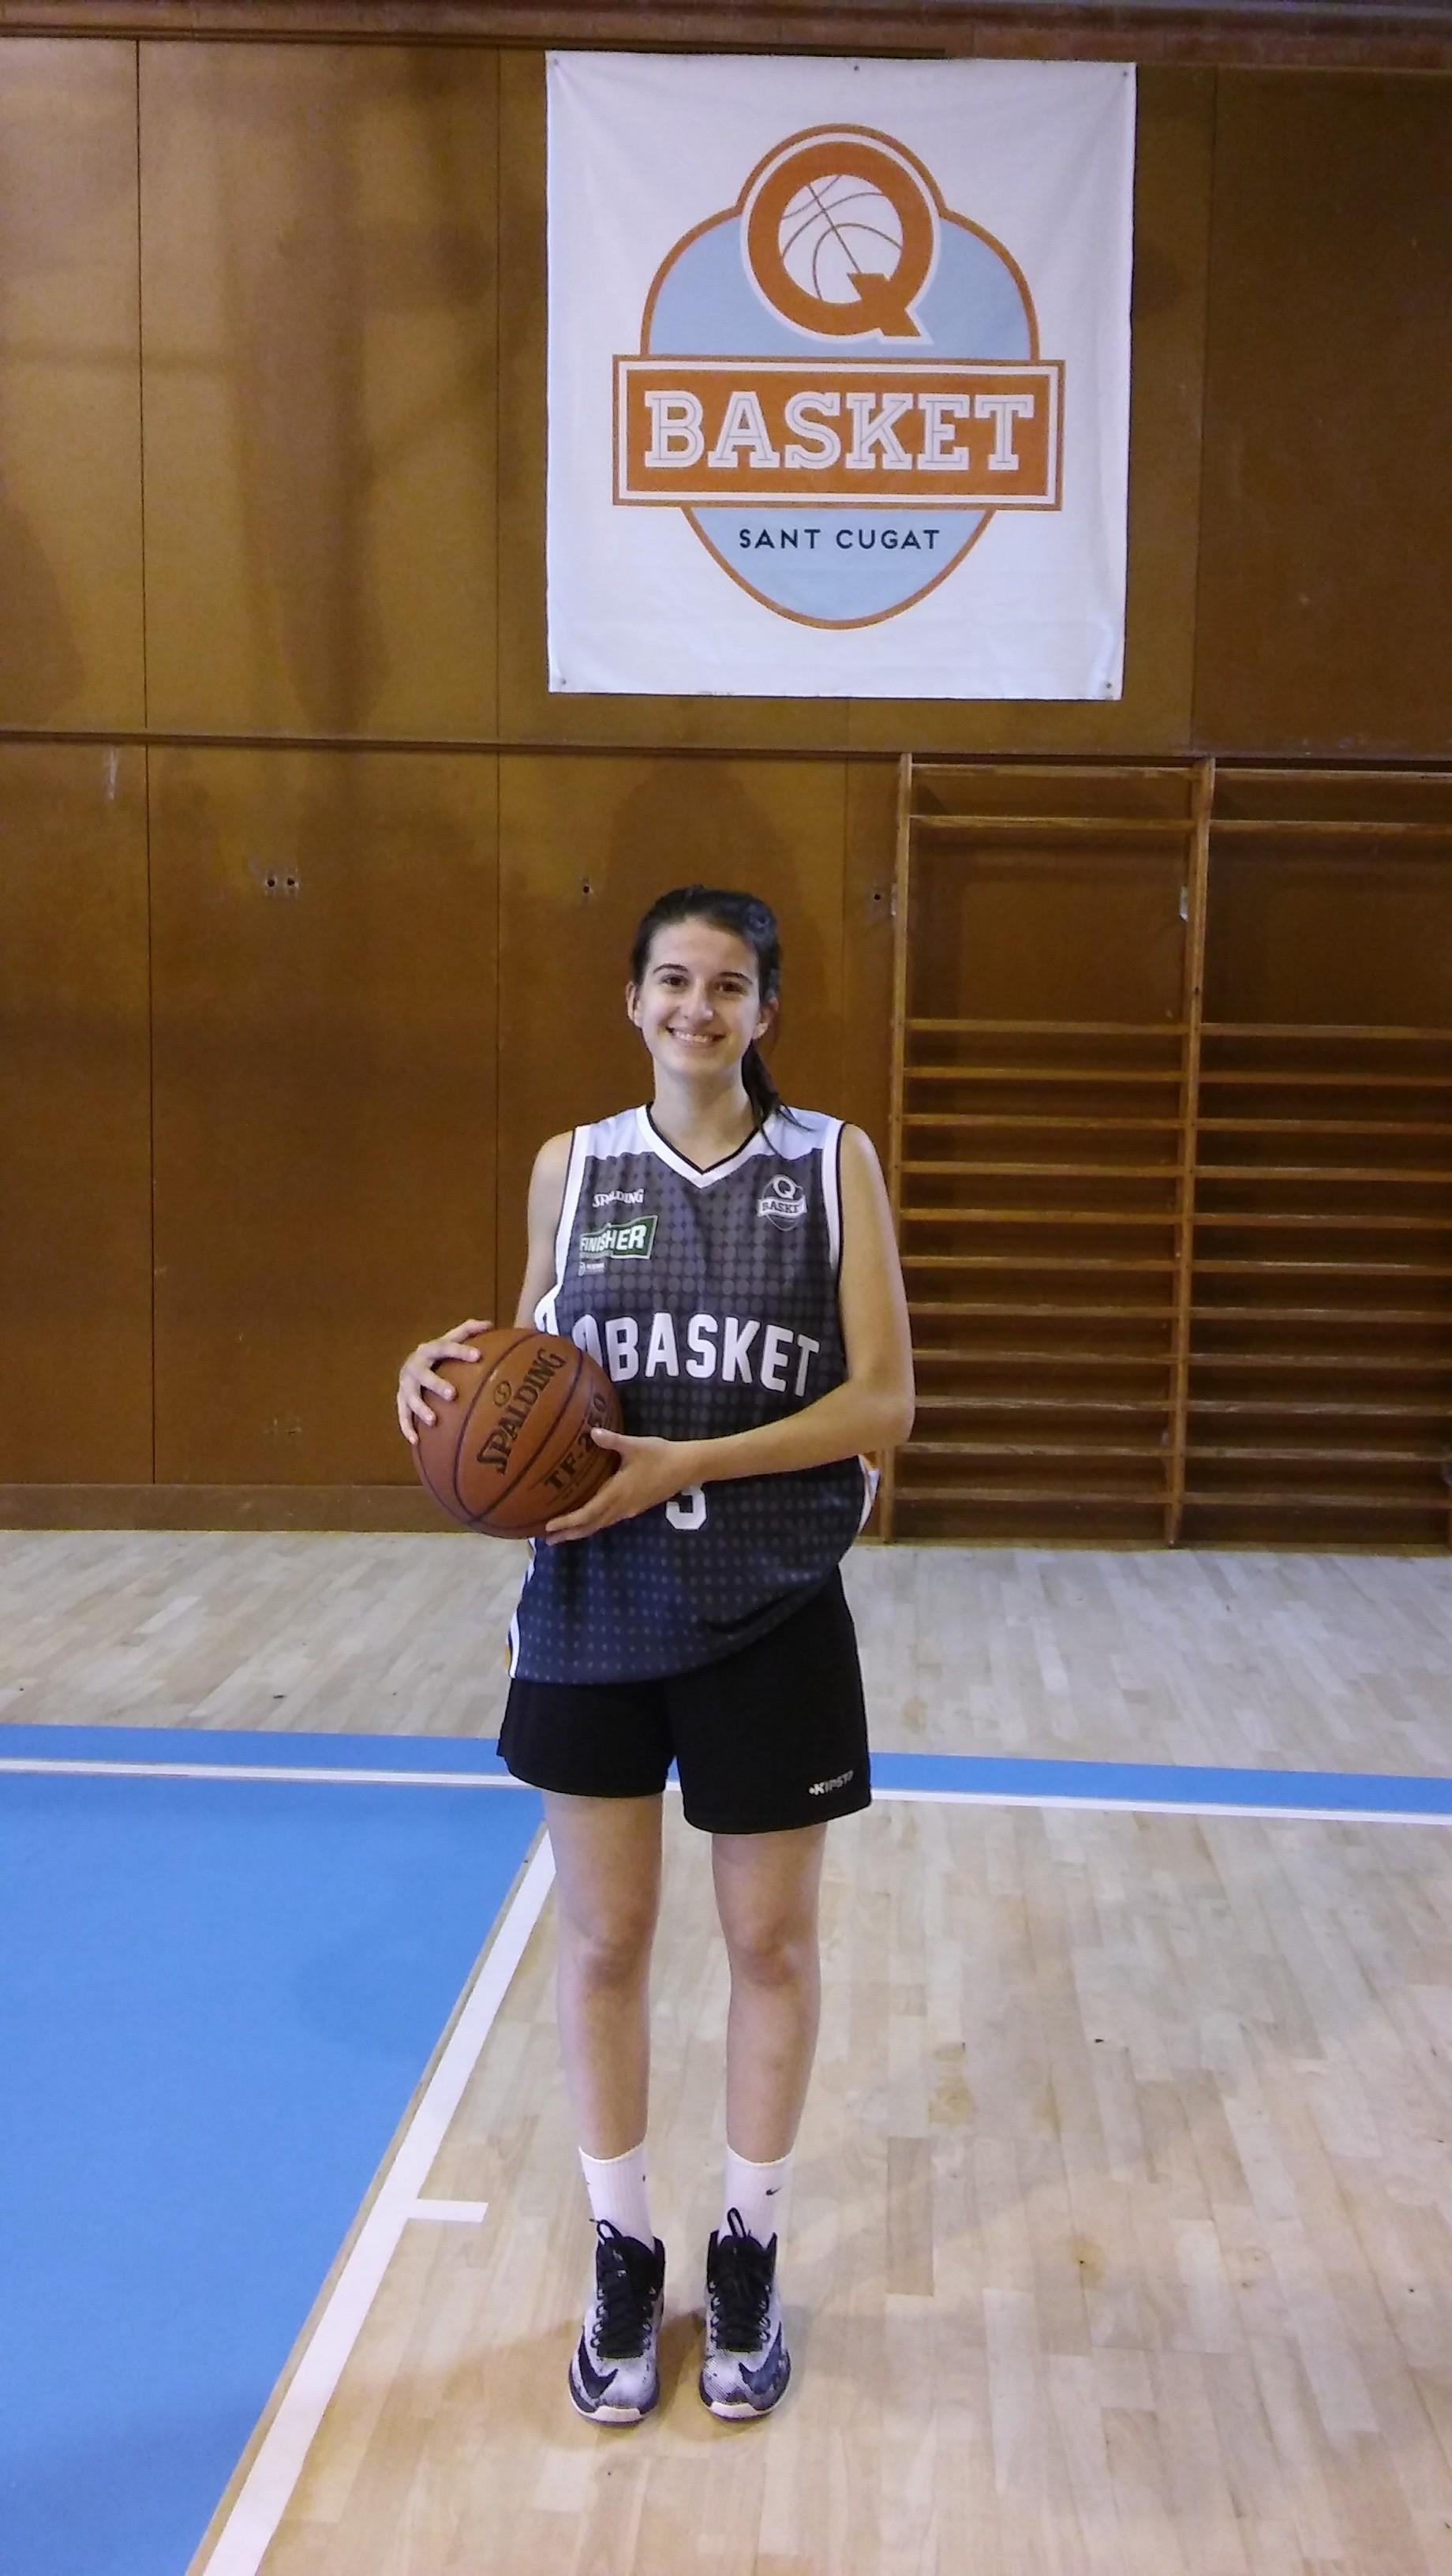 Tania Codina